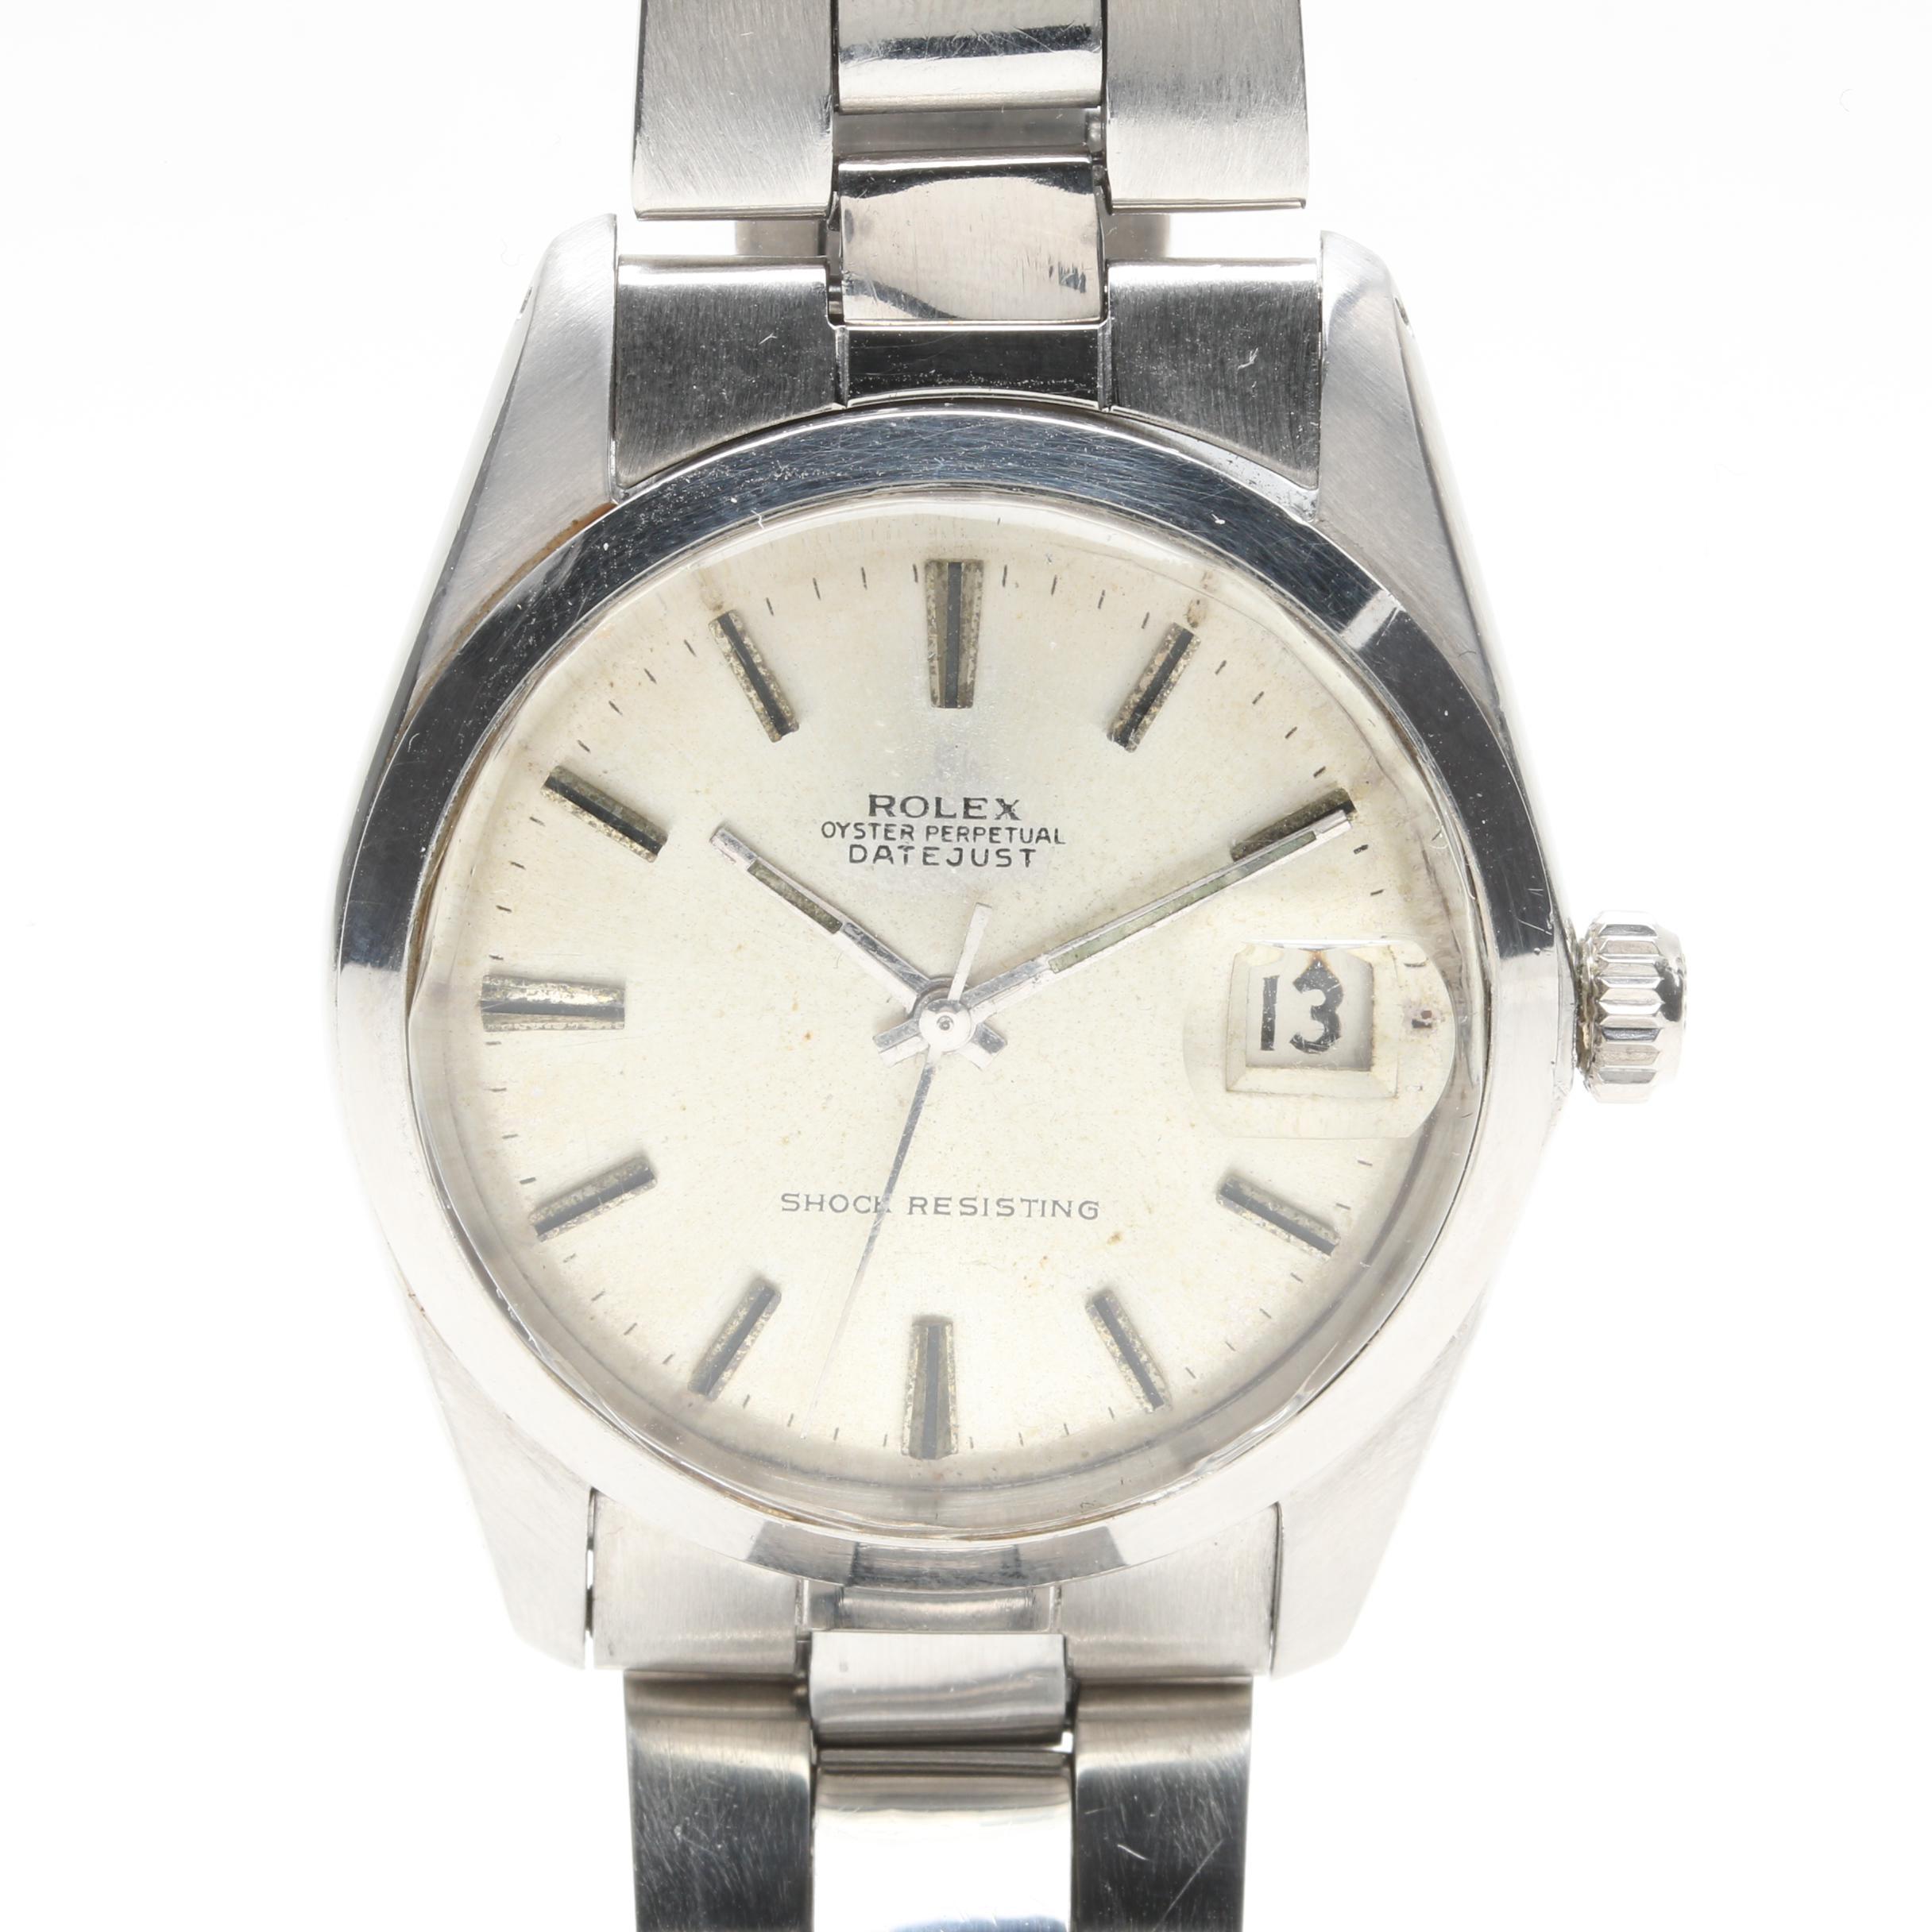 Vintage Rolex Tudor Wristwatch